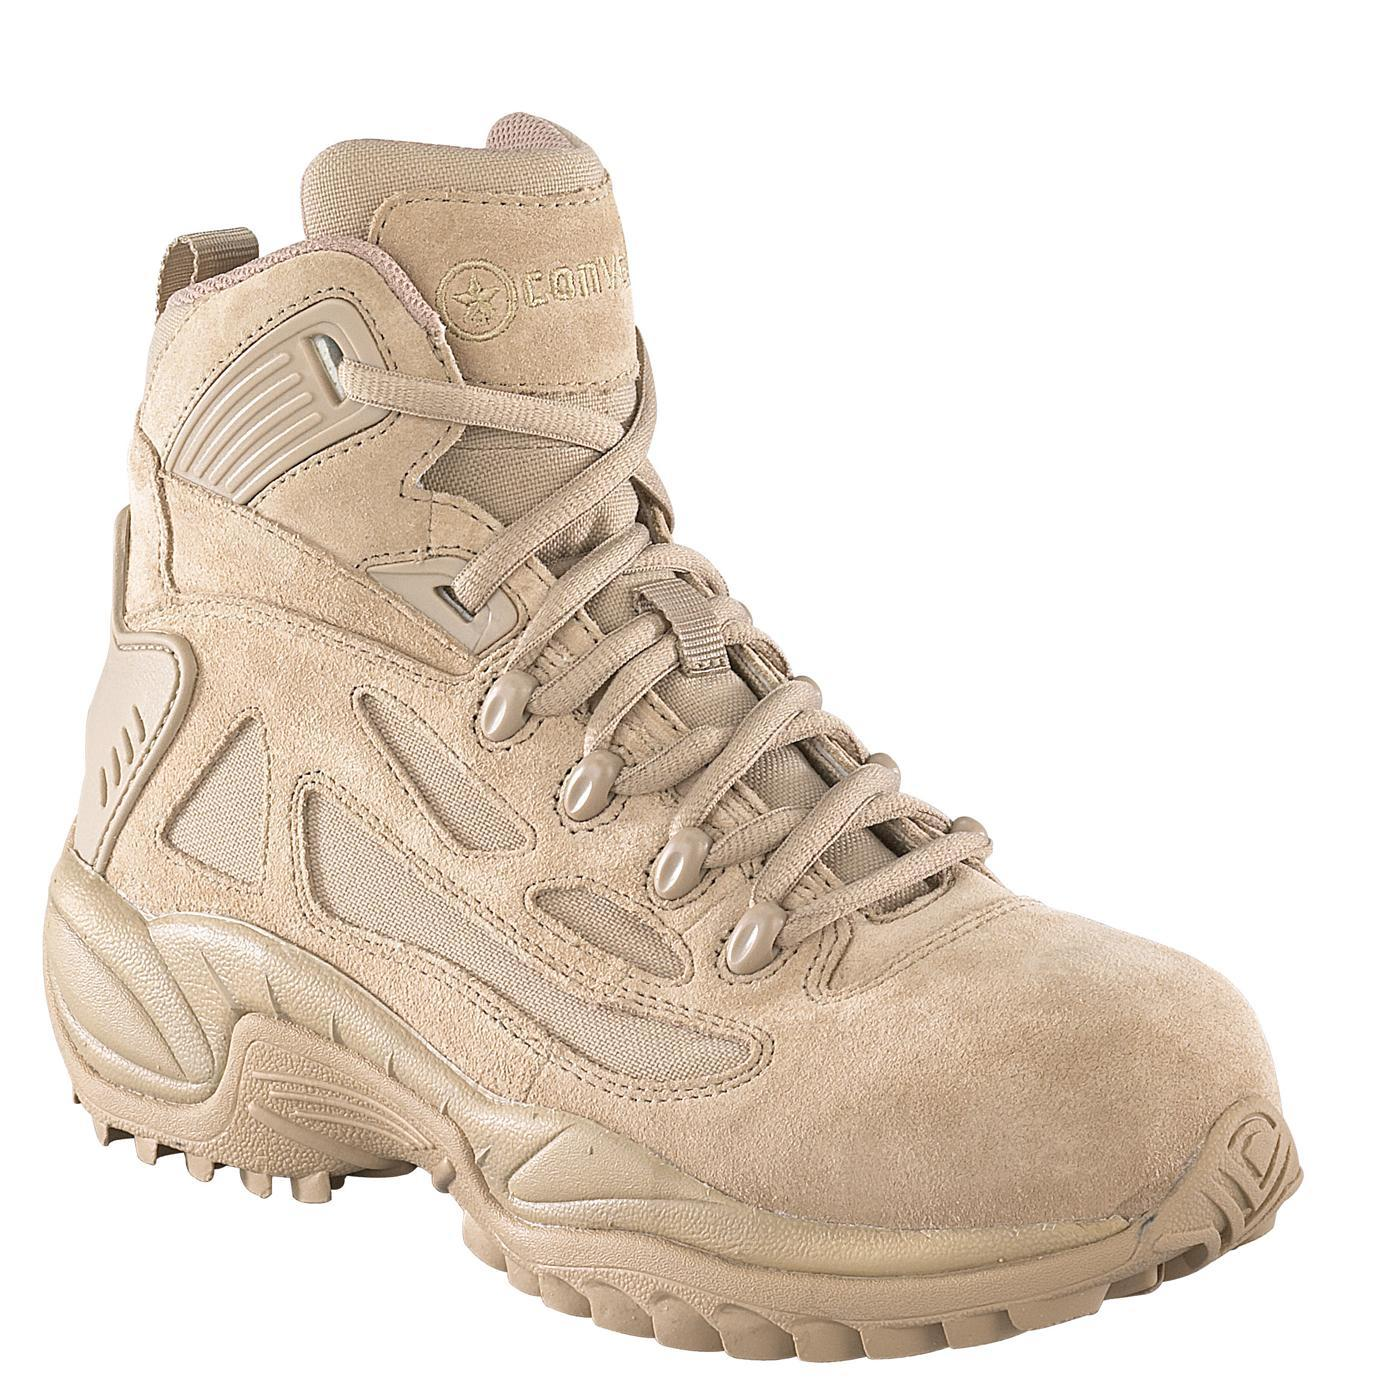 15997eaac7ae88 Converse composite toe work boots jpg 1400x1400 Converse composite toe work  boots